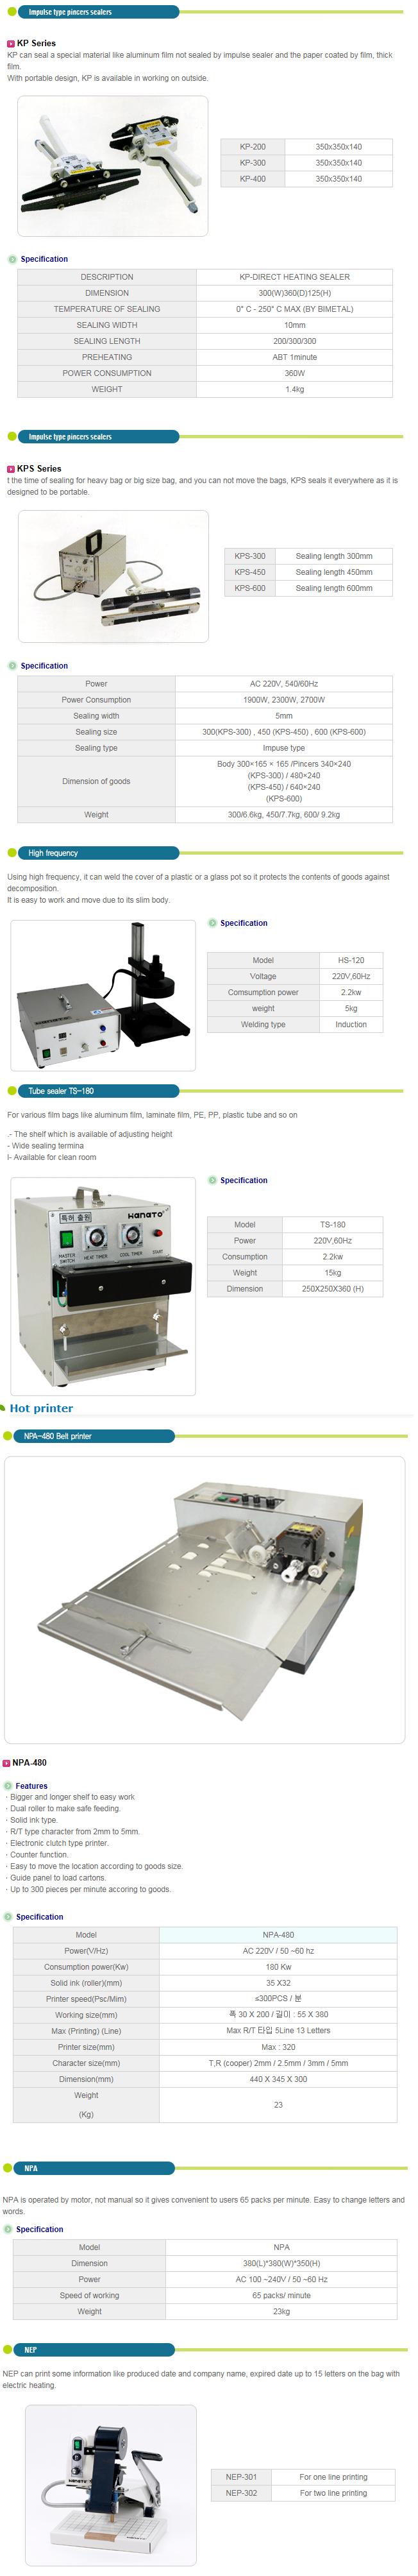 HANA Sealer / Hot printer